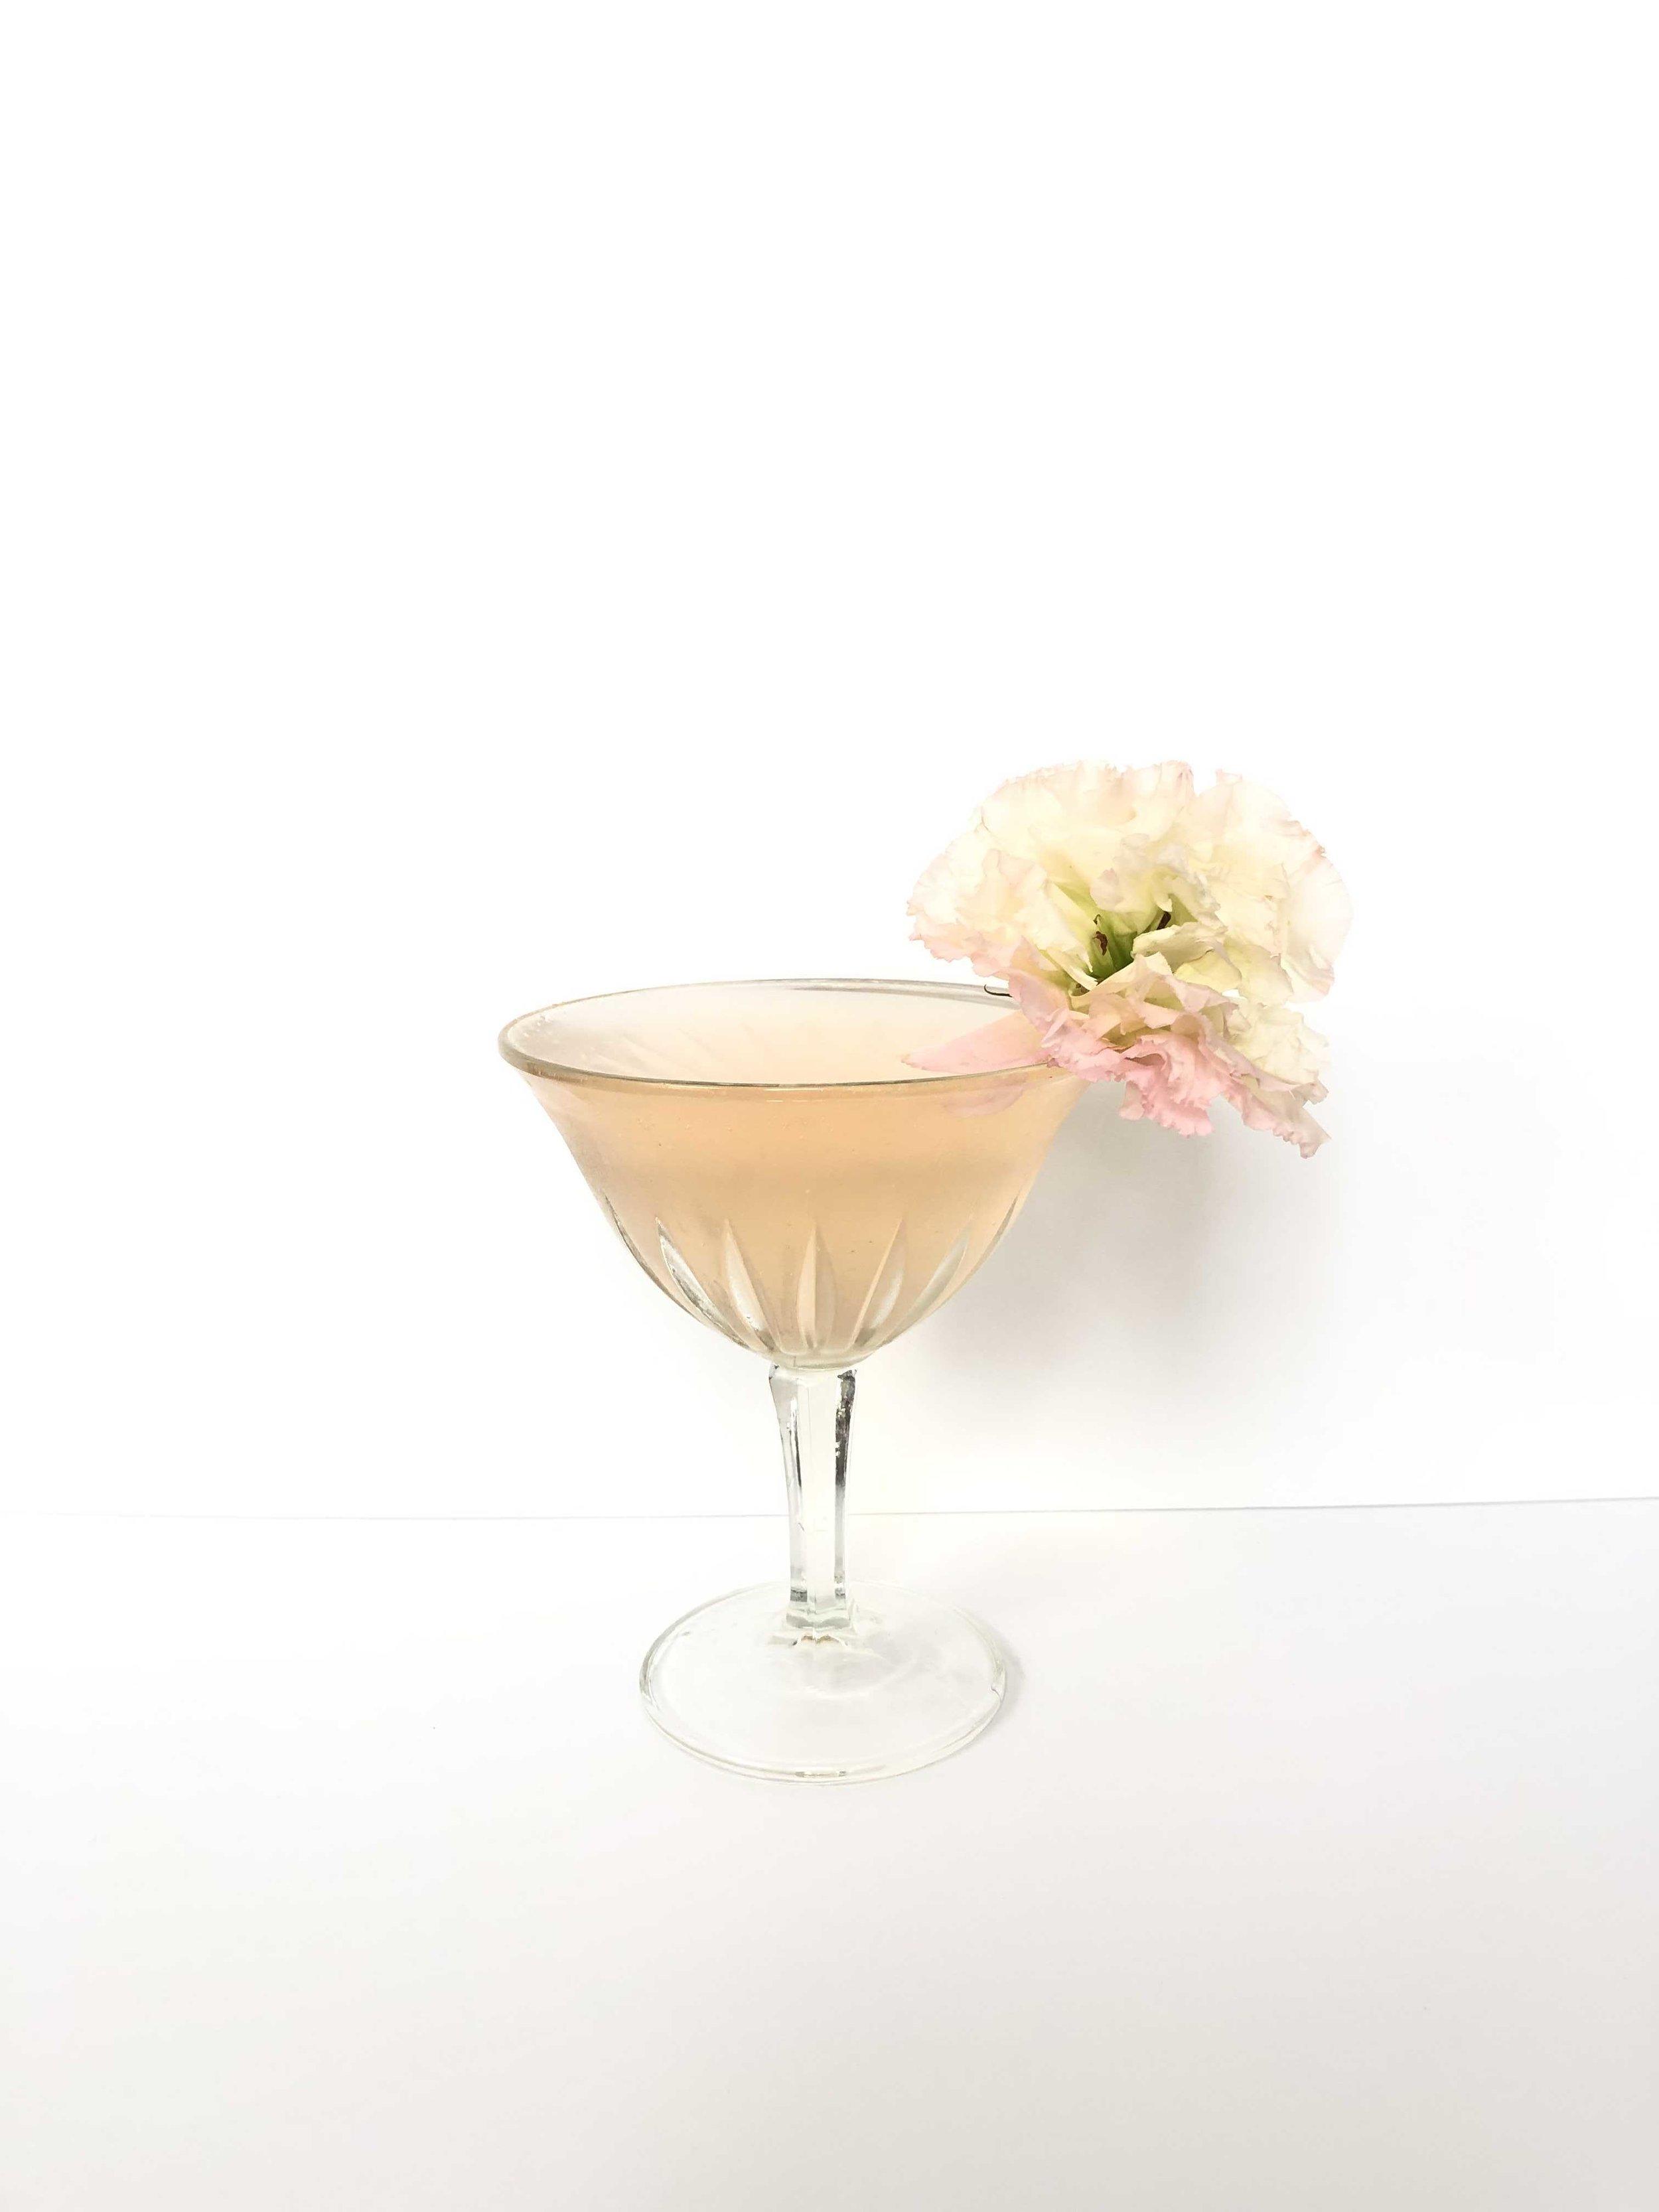 Cucumber Rose - 2 oz Kettle One Botanical Cucumber Mint Vodka1/2 oz lemon juiceSplash of rose waterTop with Topo Chico